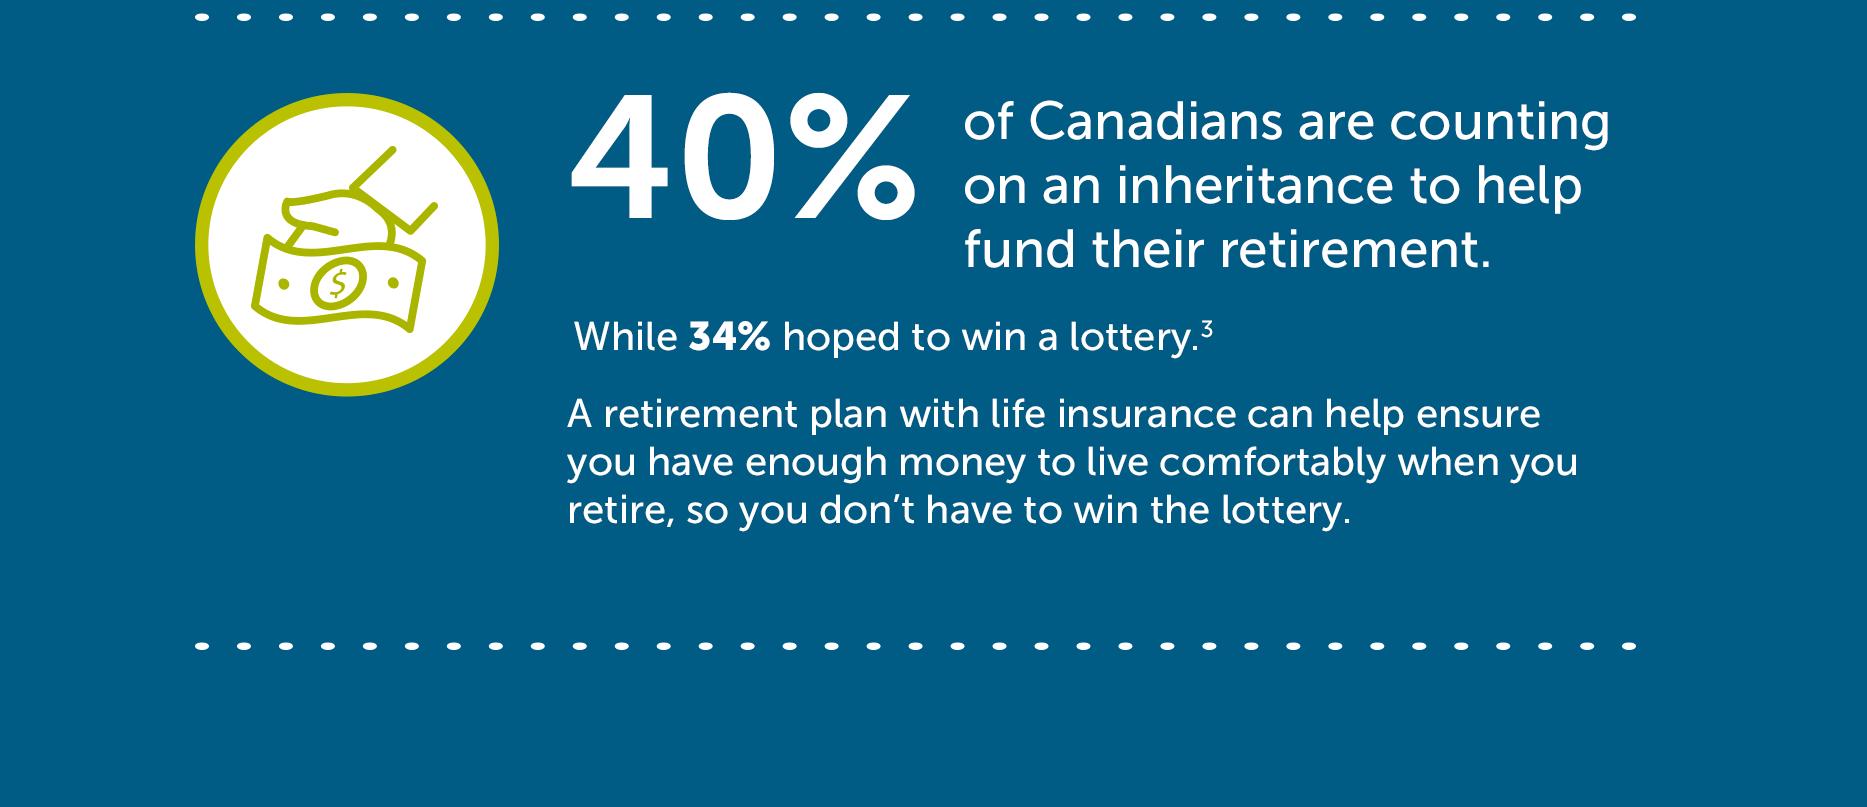 Canadian retirement statistic